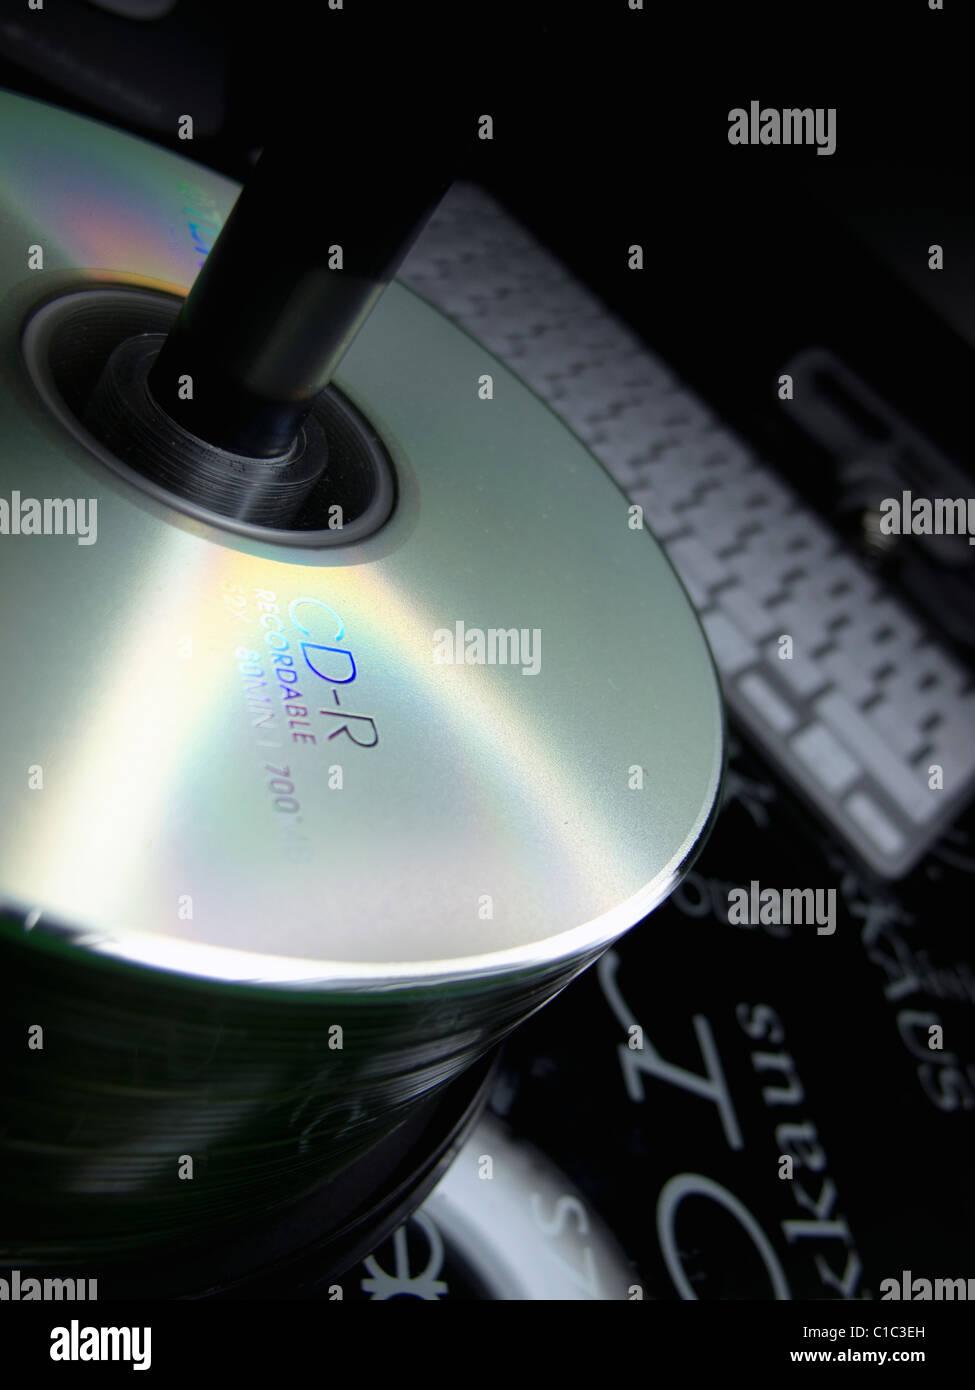 CD-R Disc - Stock Image